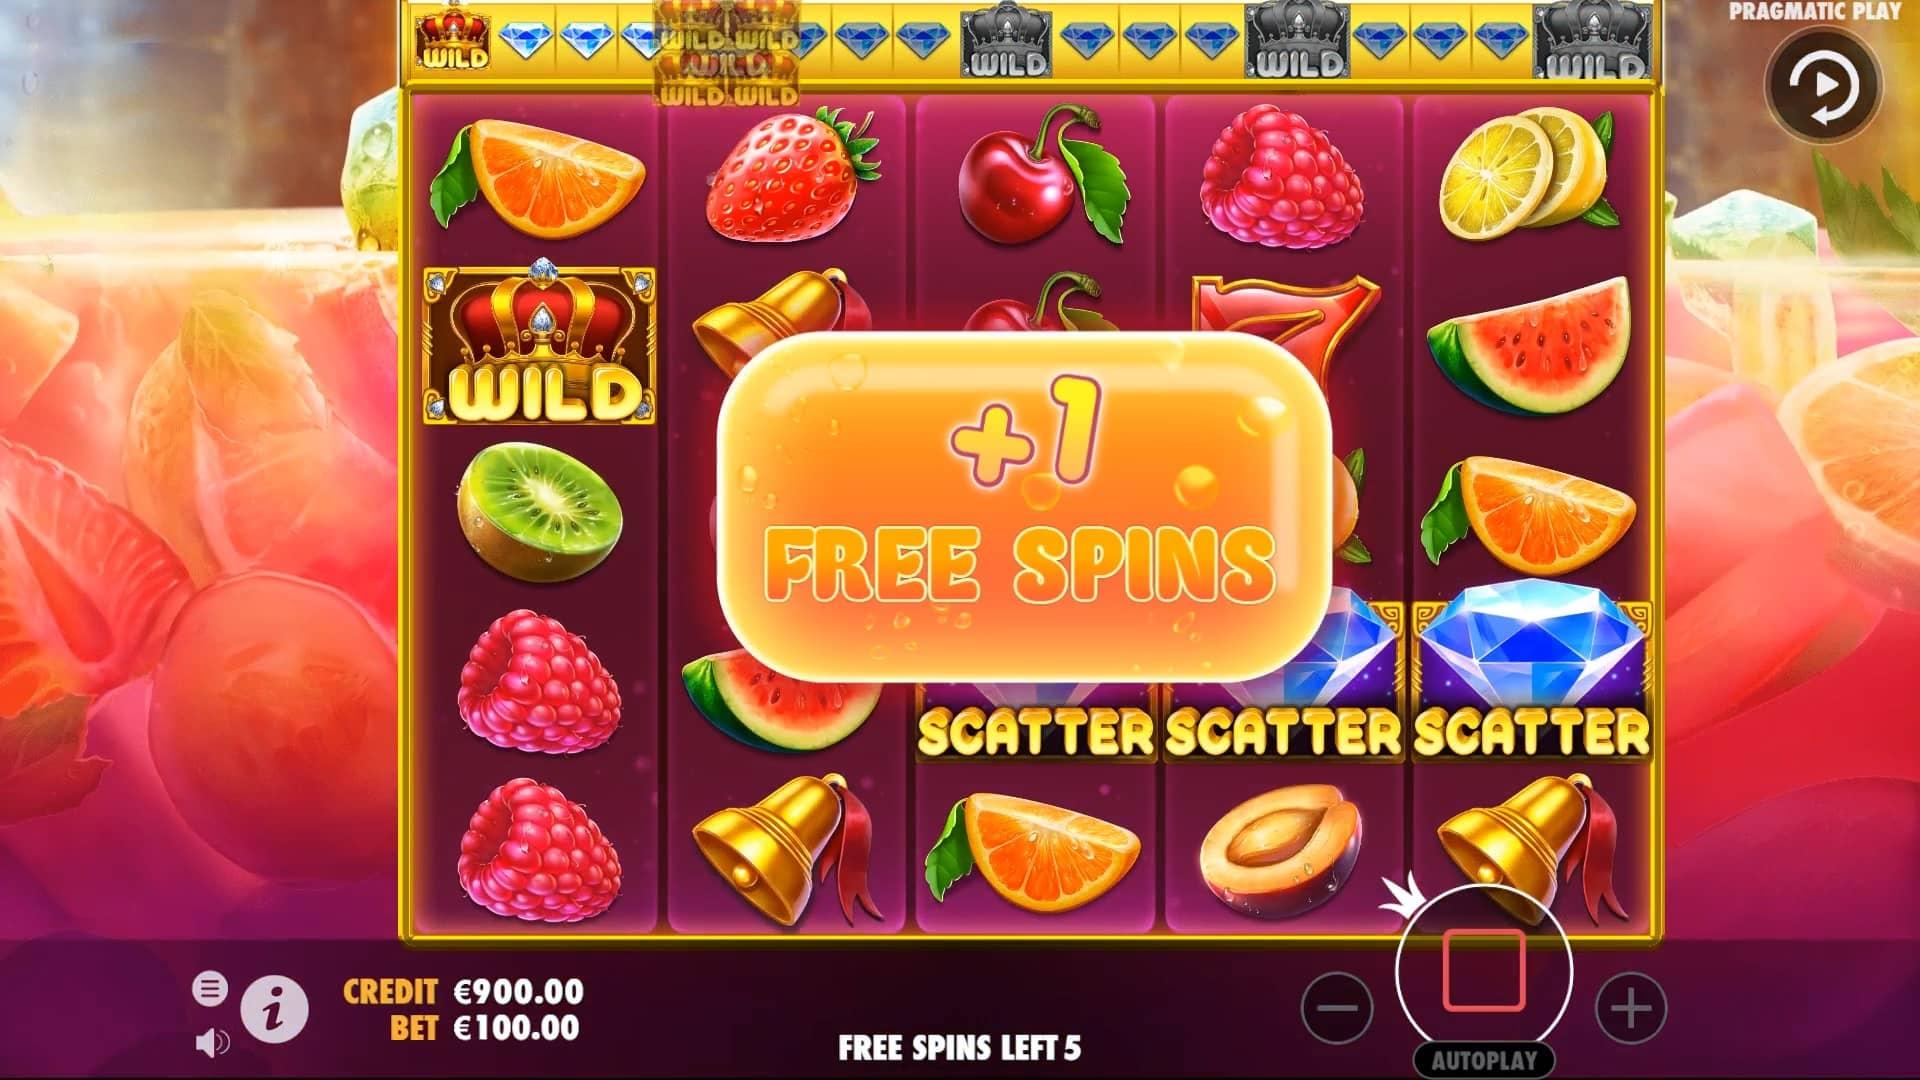 Juicy Fruits Slot Free Spins